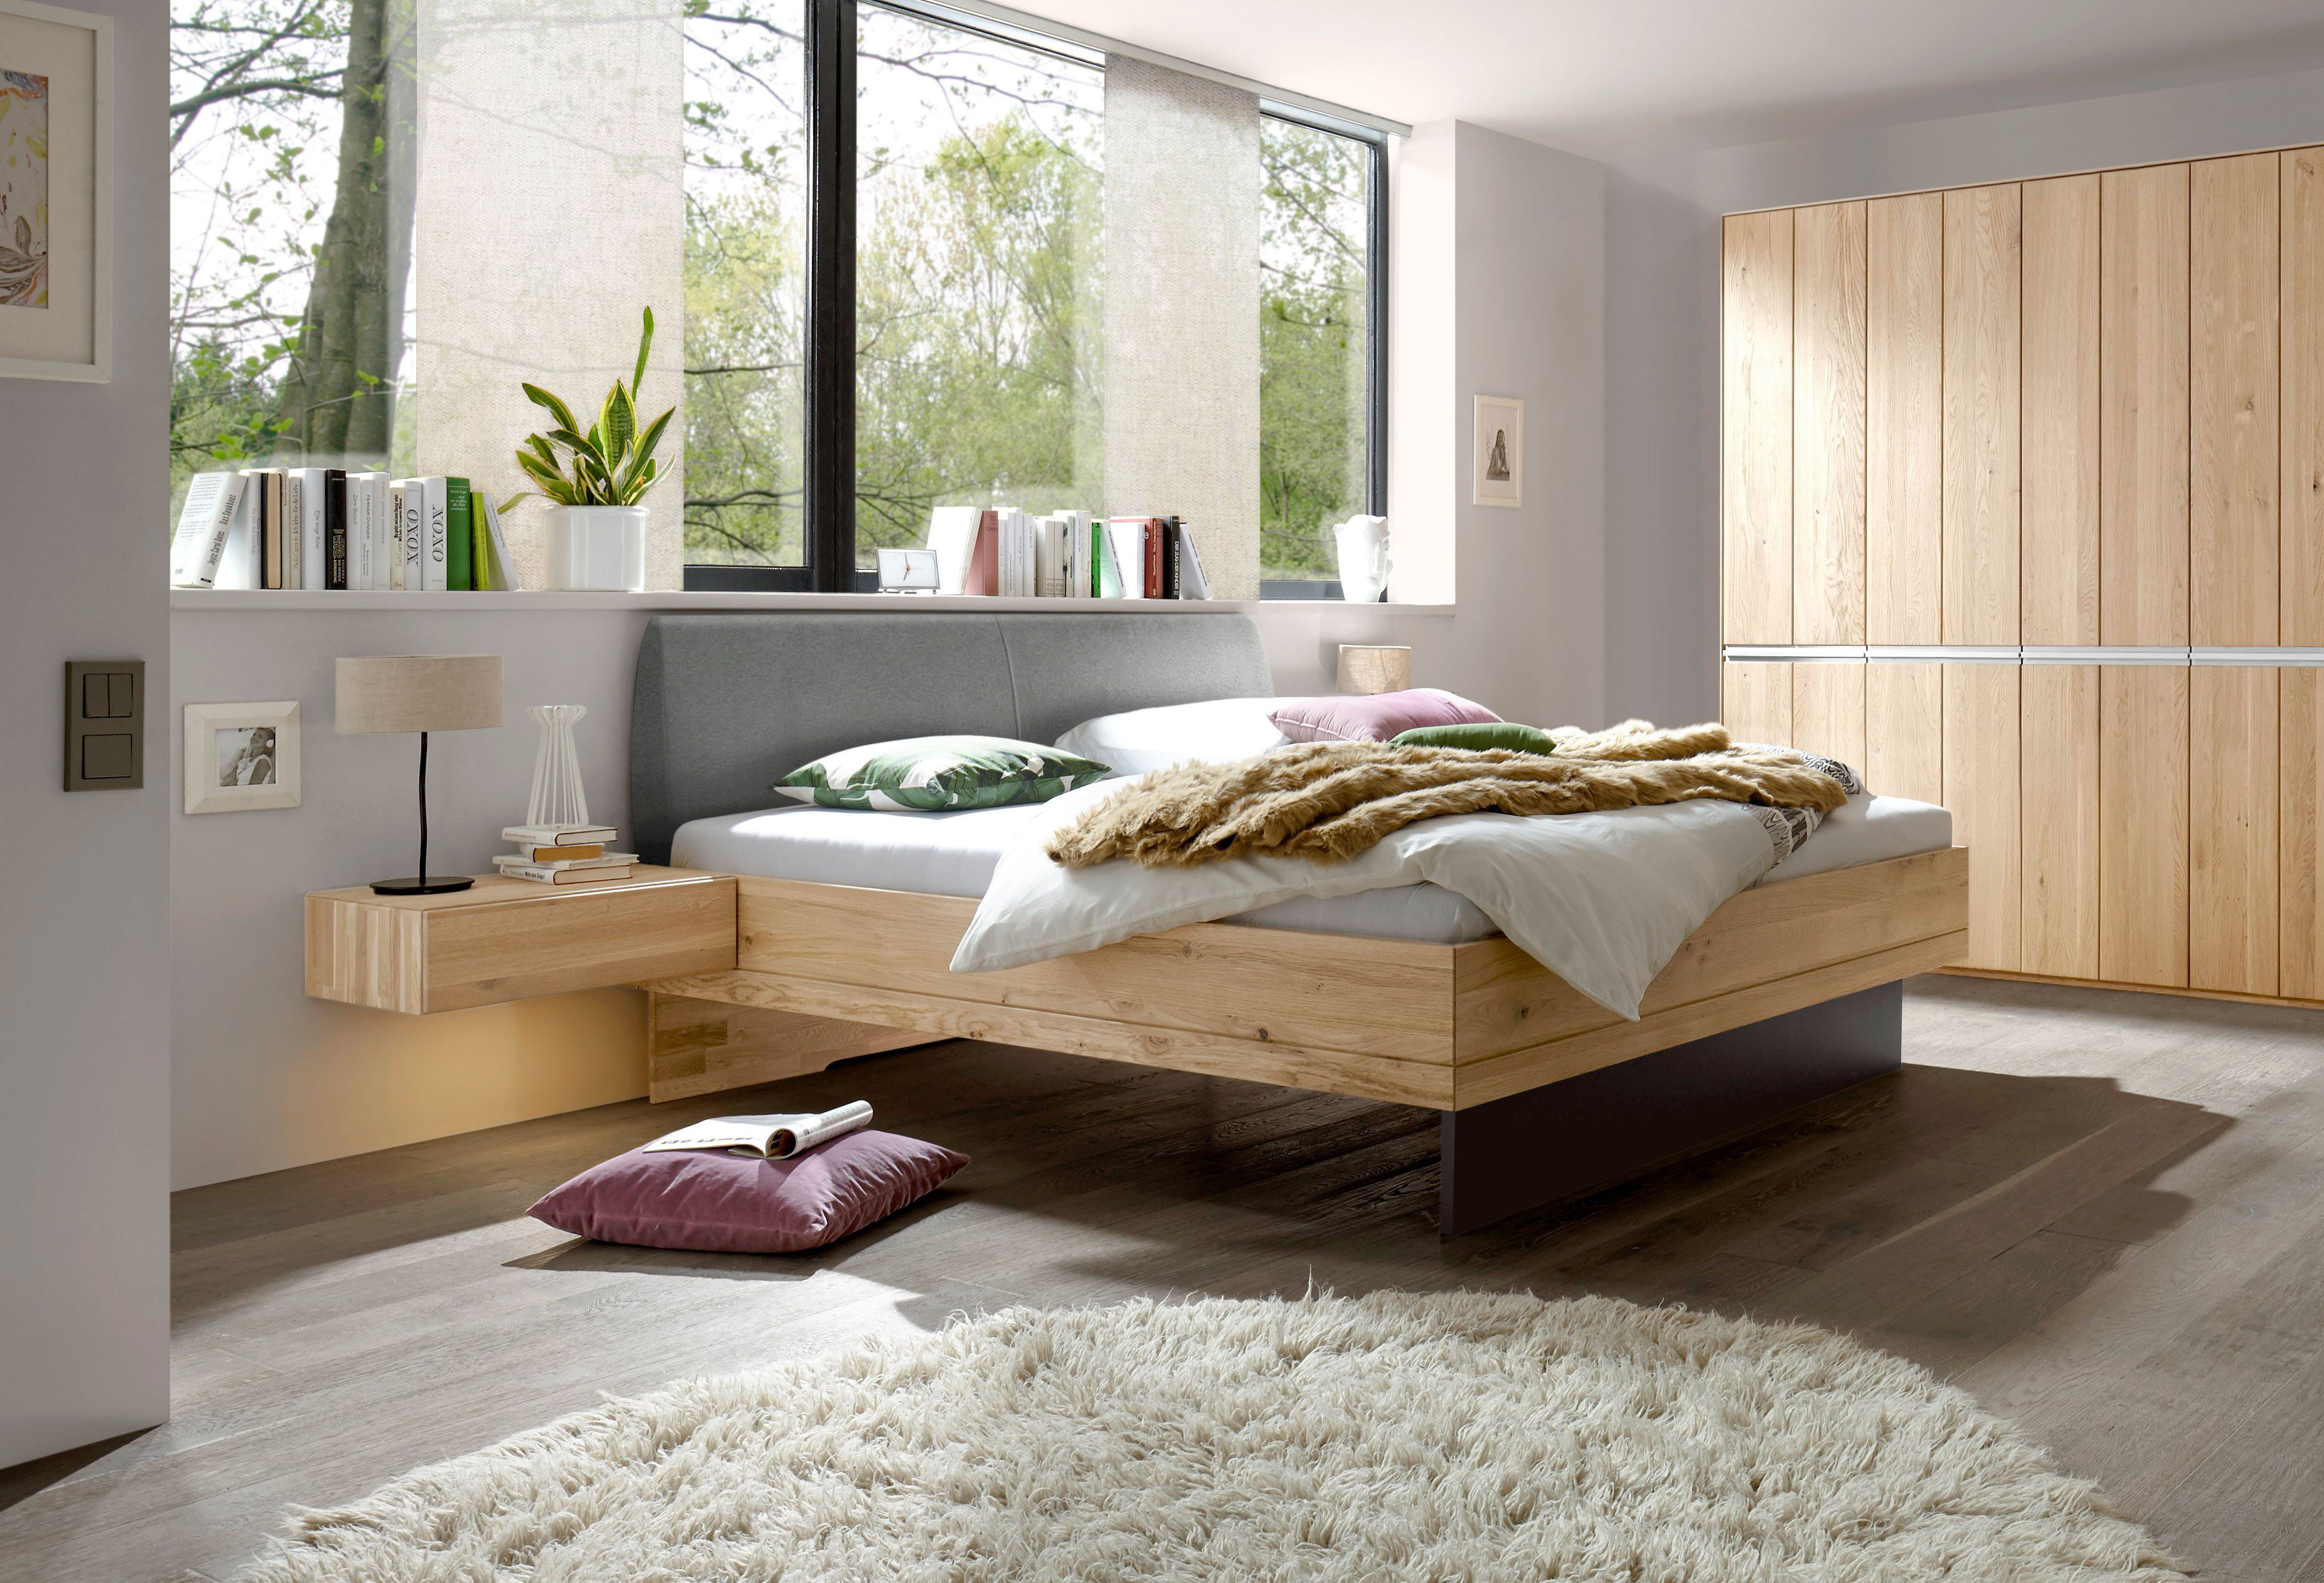 Schwebendes Bett Simple Holzbett U Massive Betten Aus Holz In